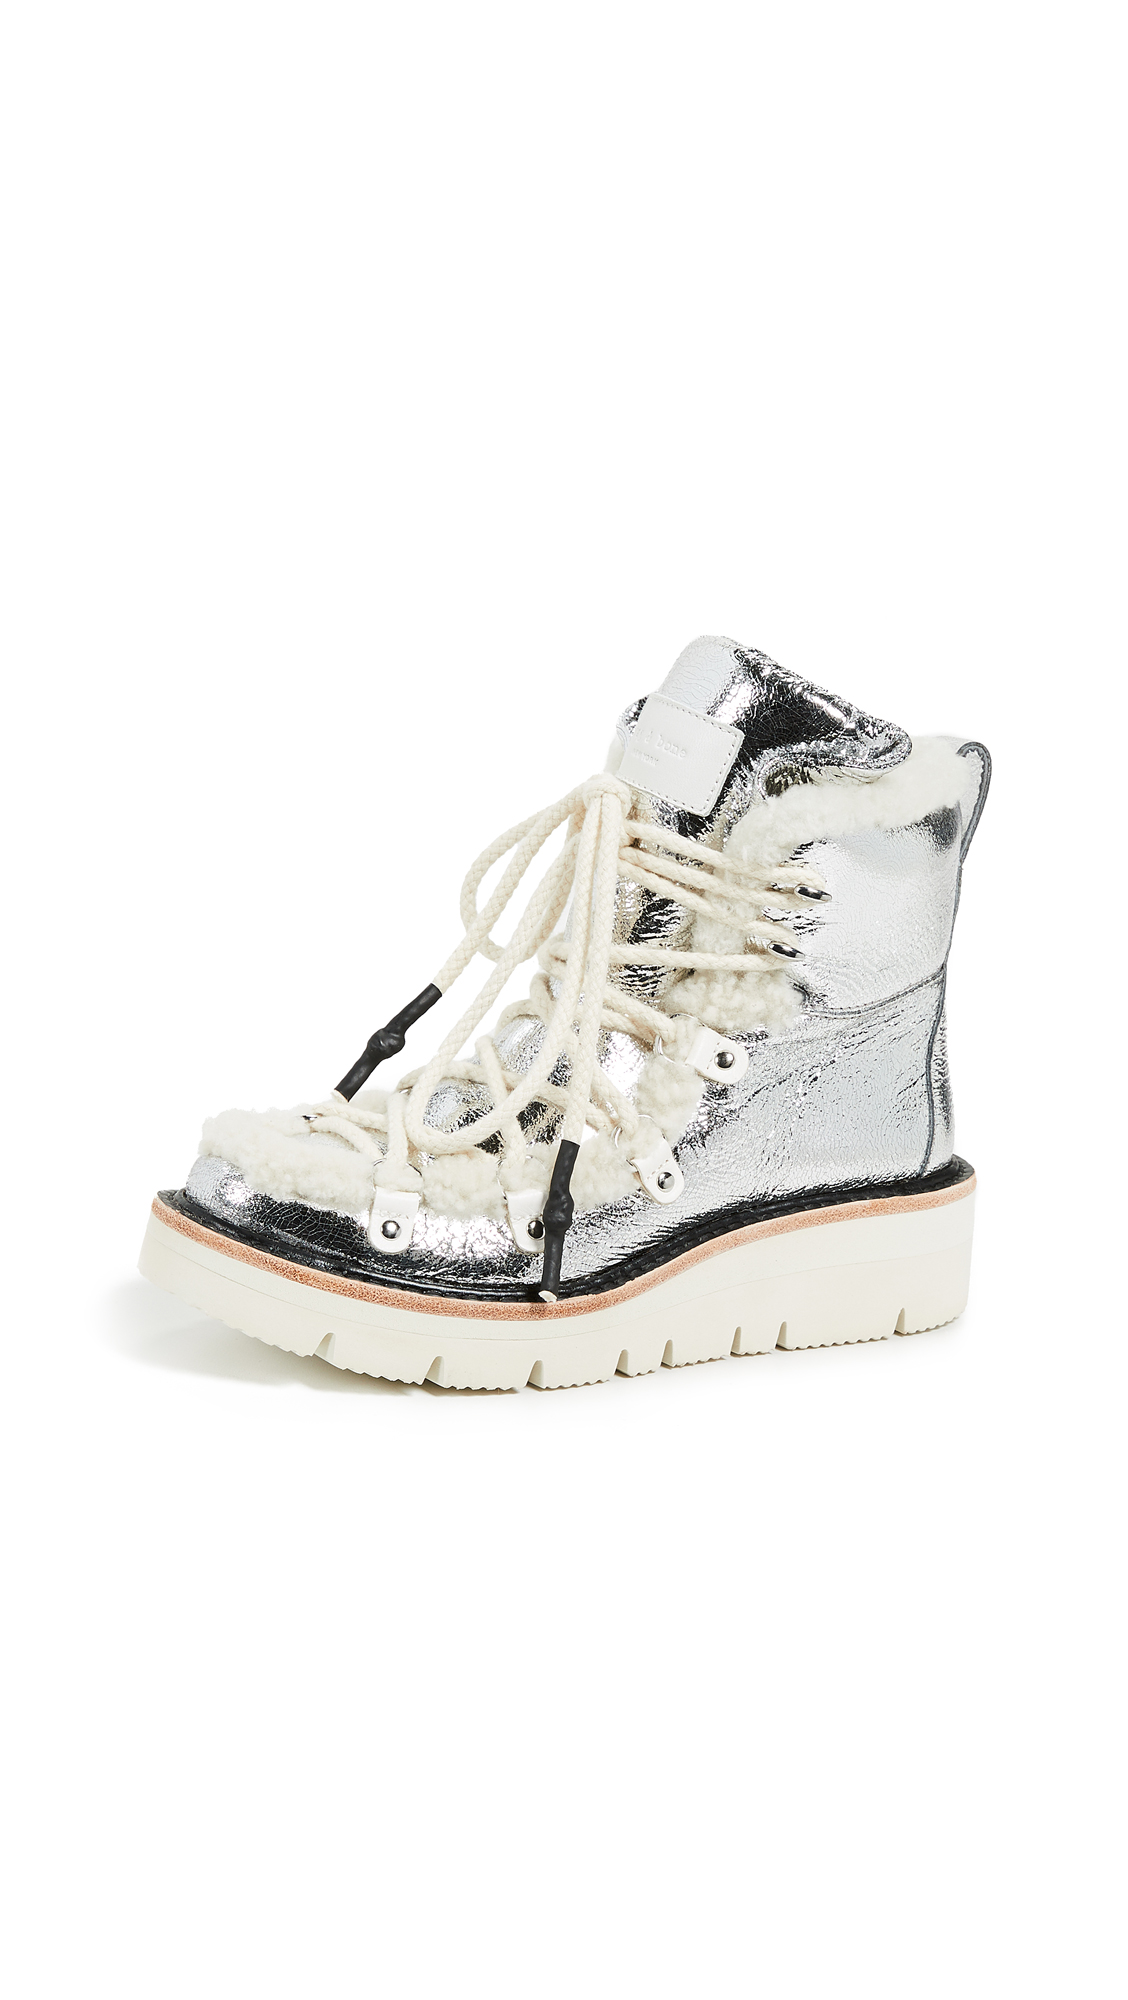 Rag & Bone Skyler Boots - Silver